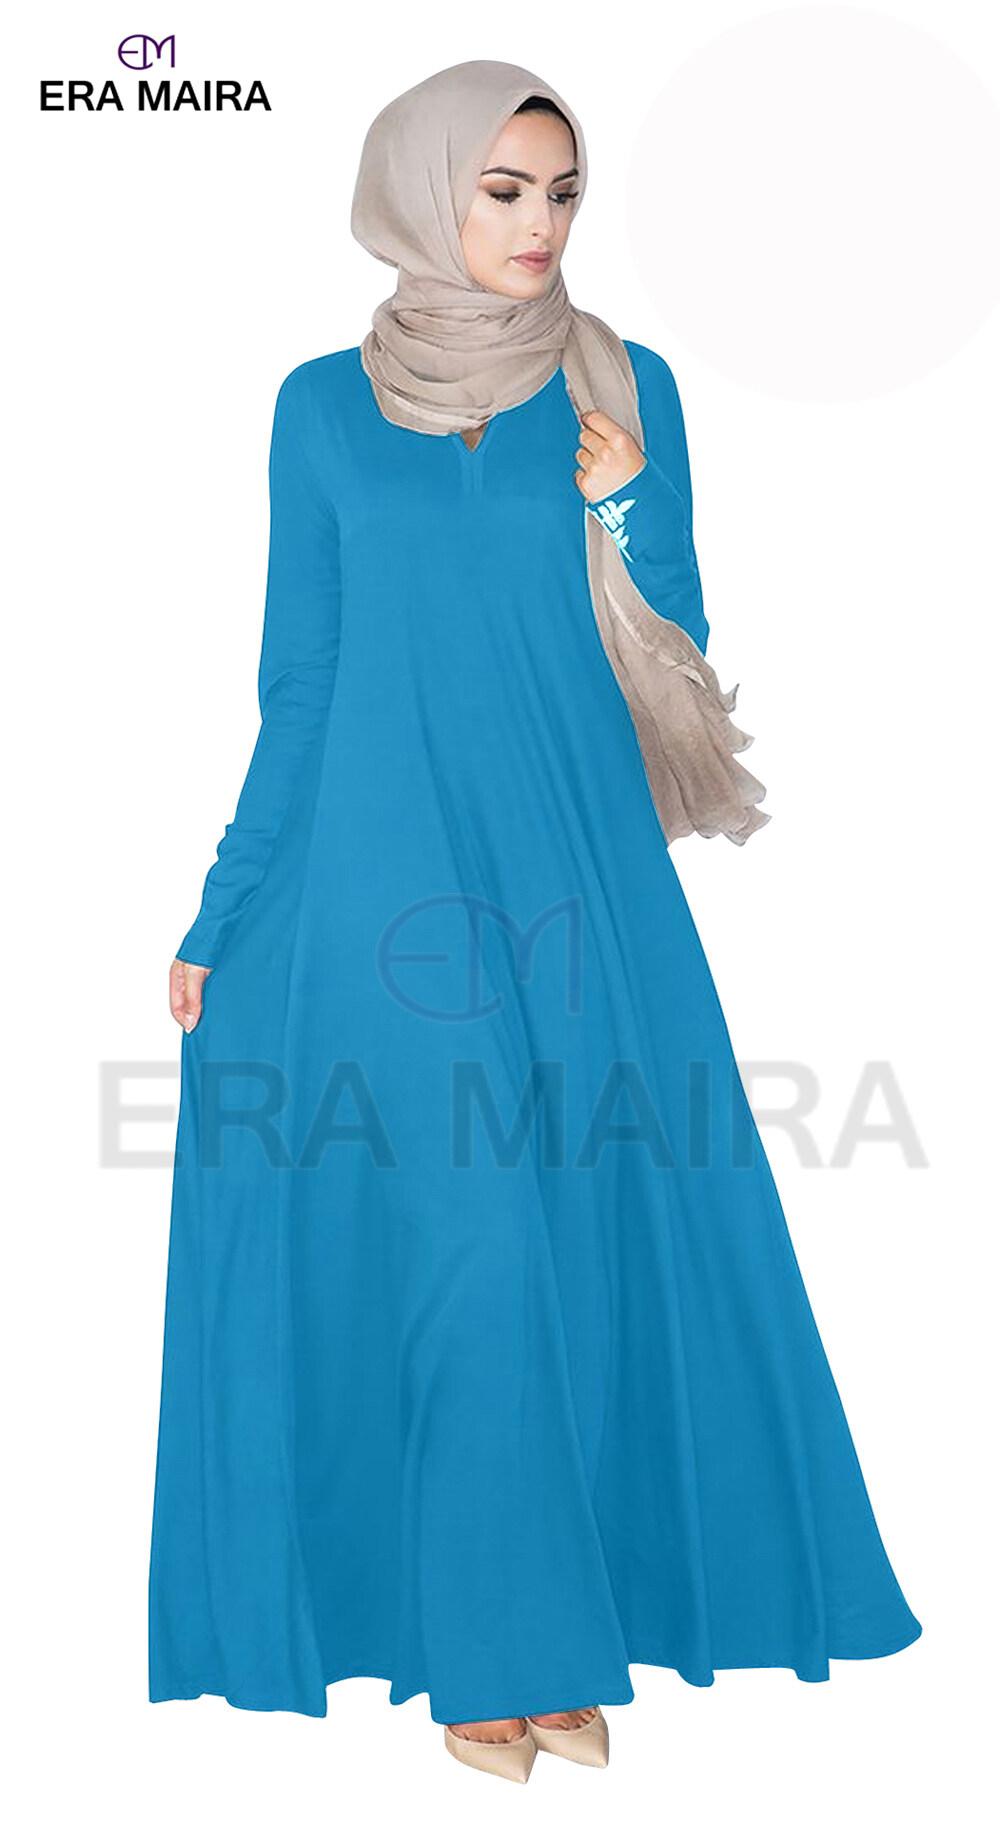 Wide bottom Cut plain jubah abaya for muslimah - Diana